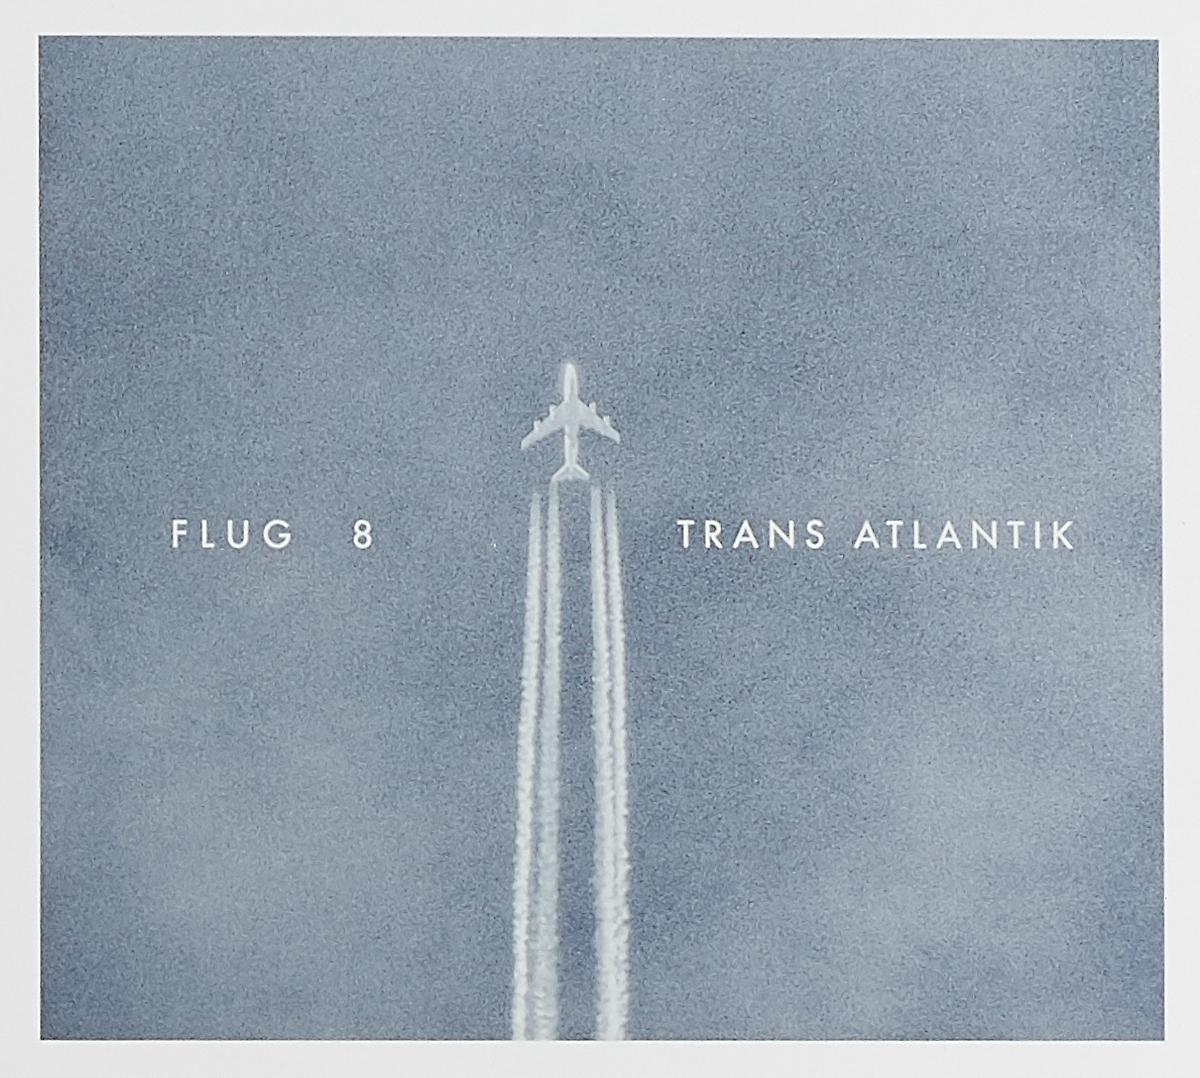 цены Flug 8 Flug 8. Trans Atlantik